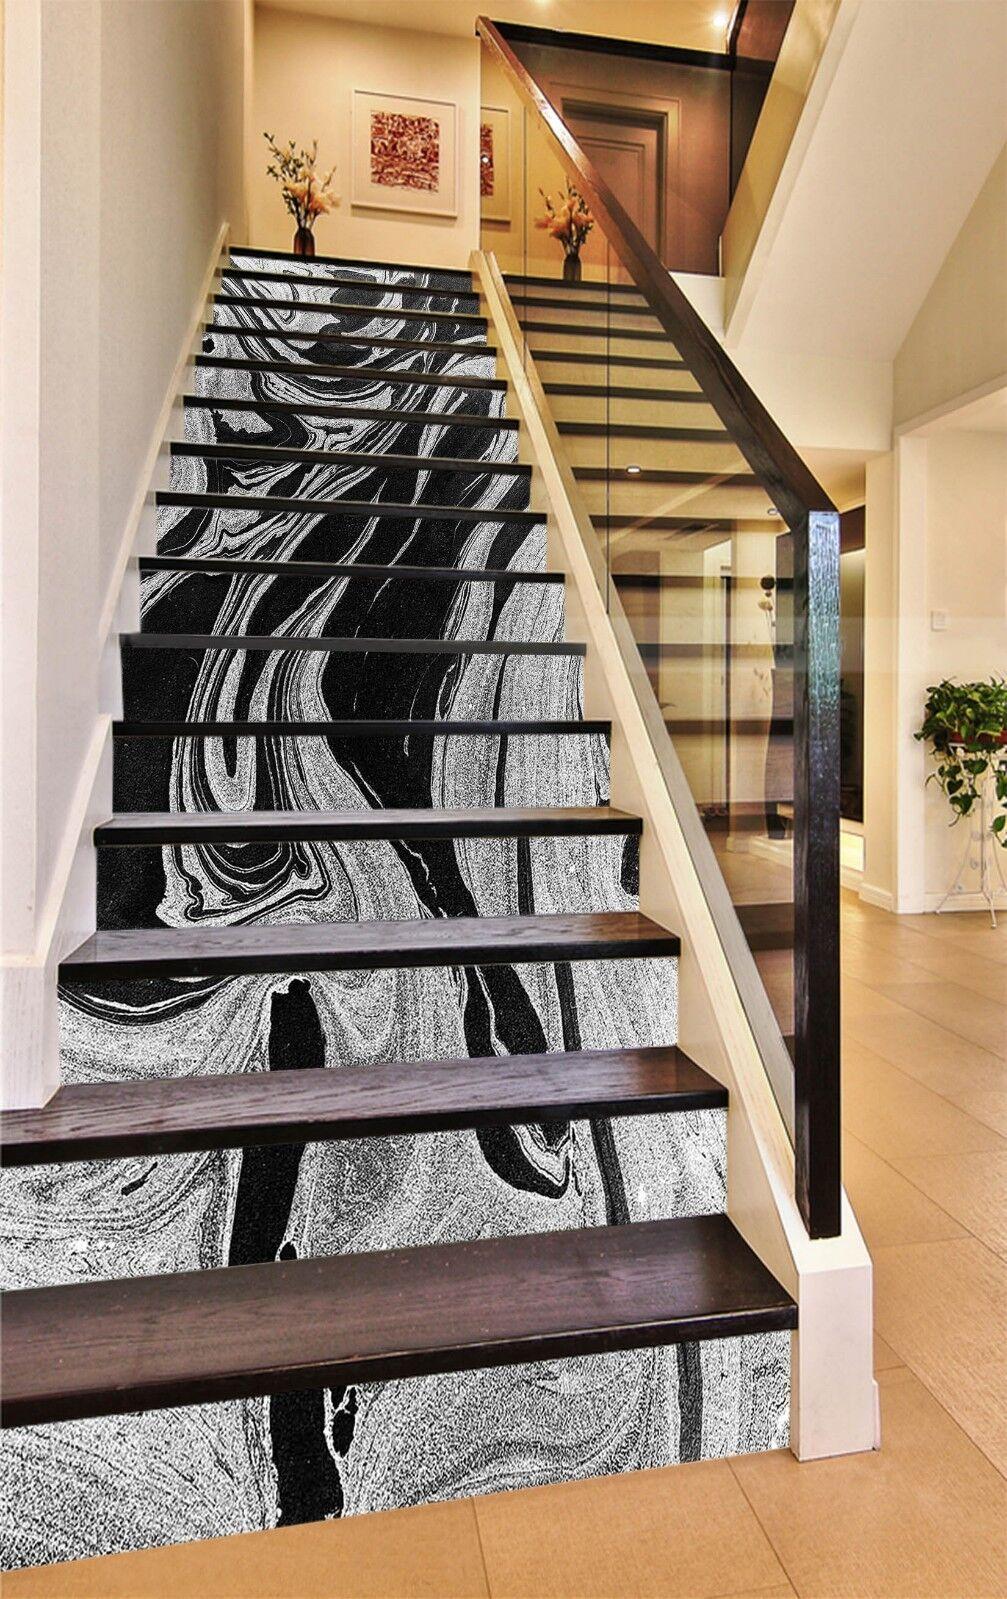 3D Schwarz Weiß 8 Fliese Marmor Stair Risers Fototapete Vinyl Aufkleber Tapete